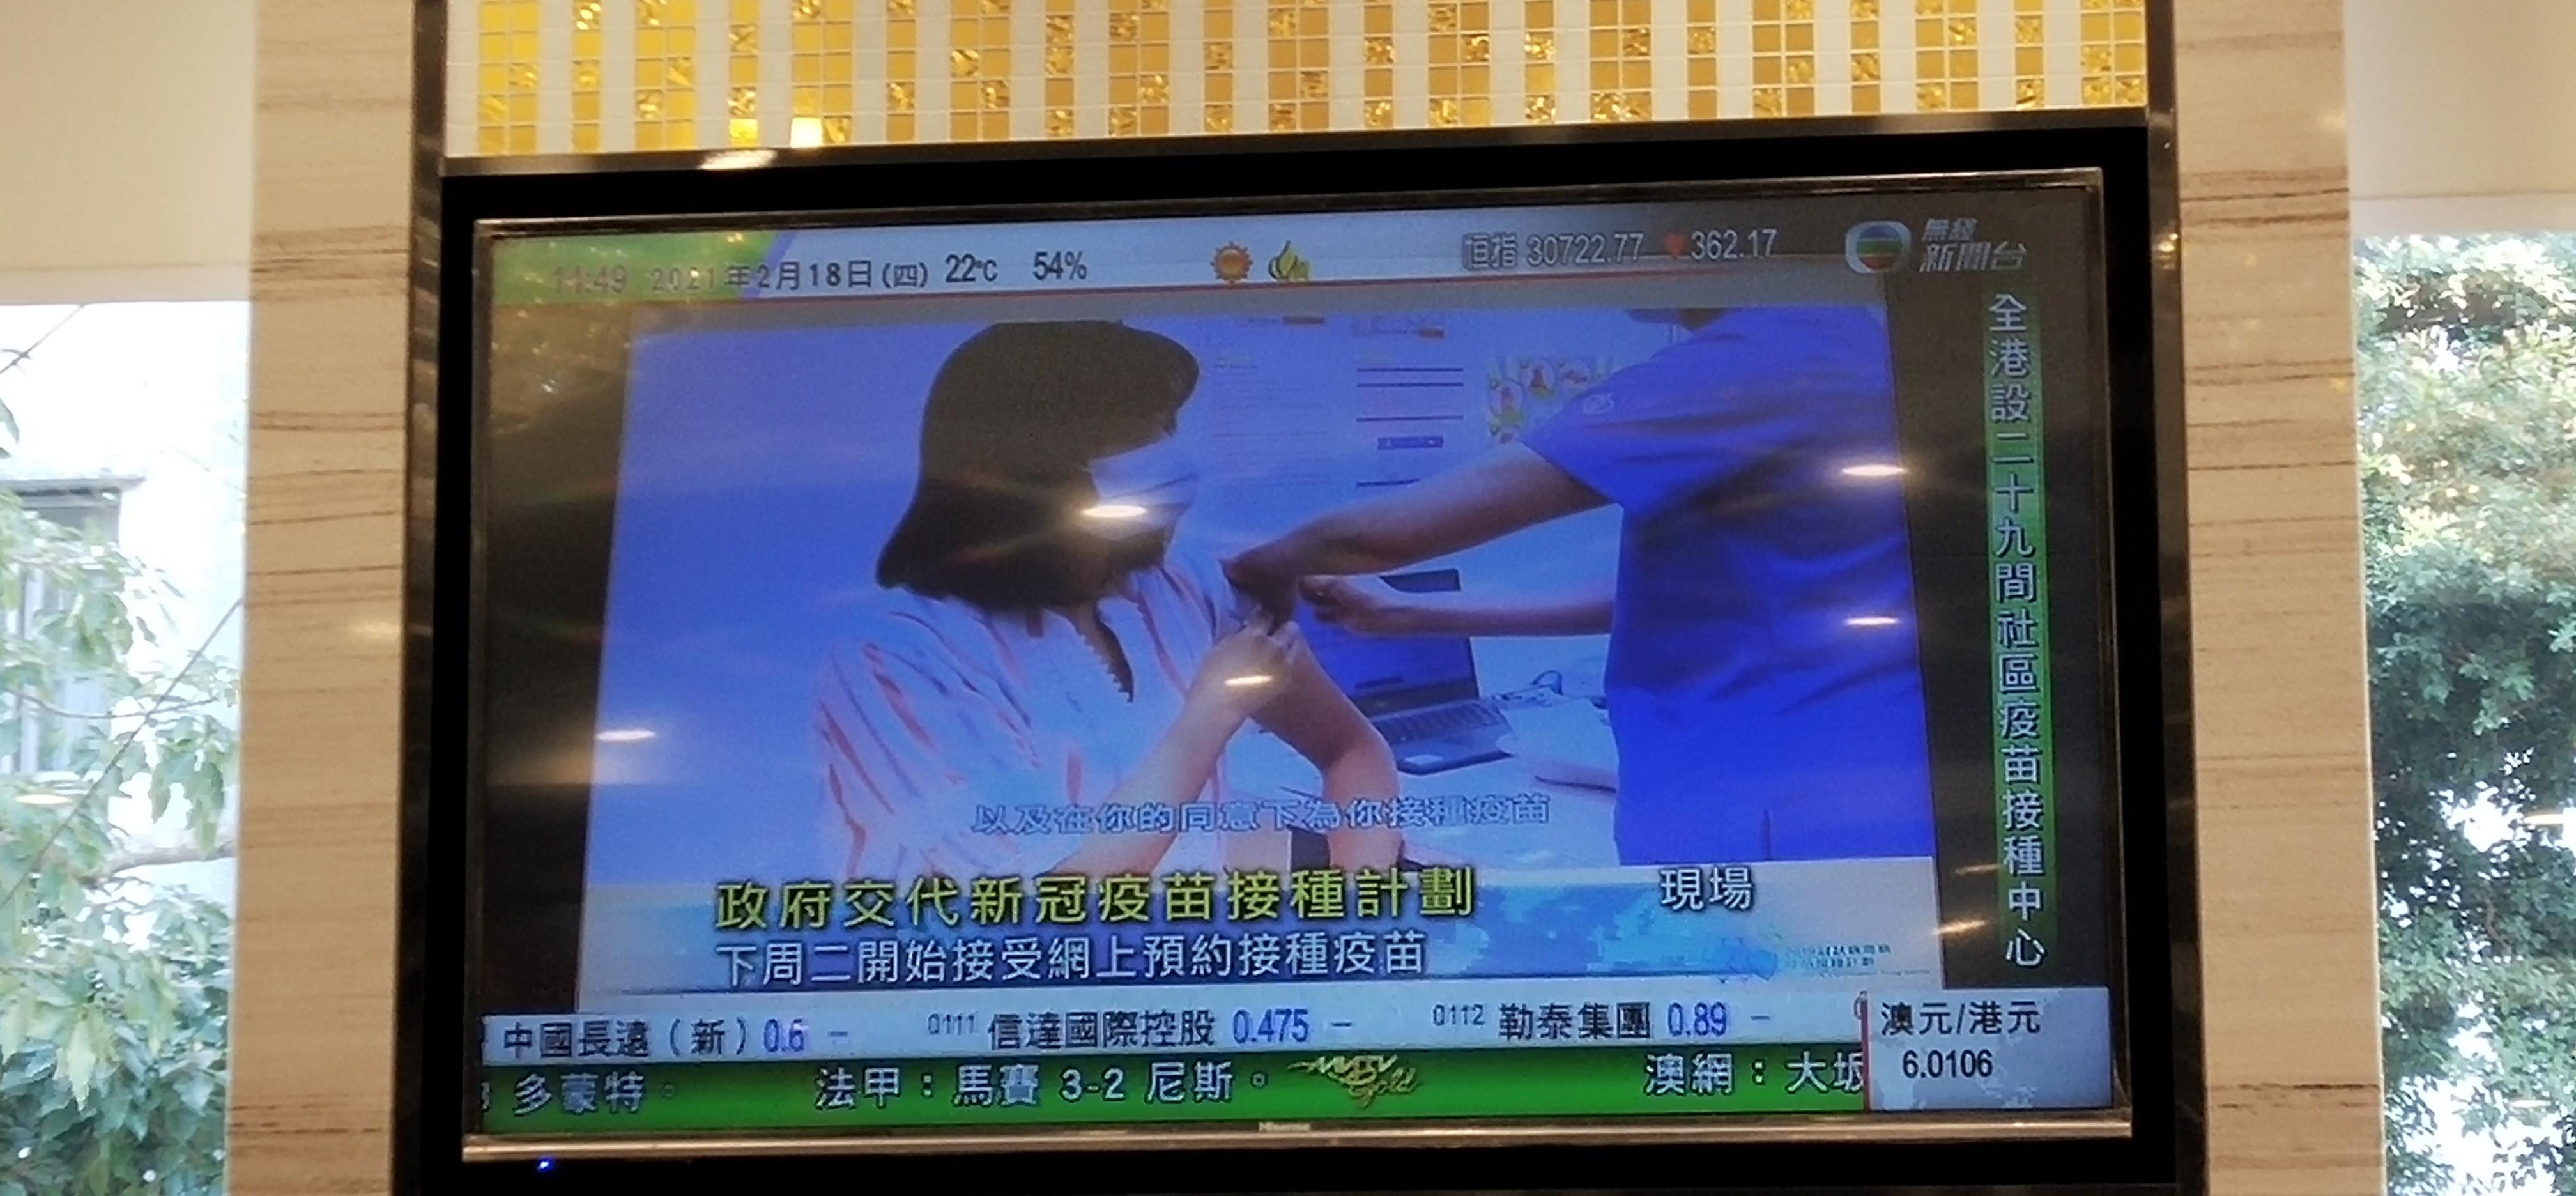 Screen, video, lady, taking vaccine, nurse